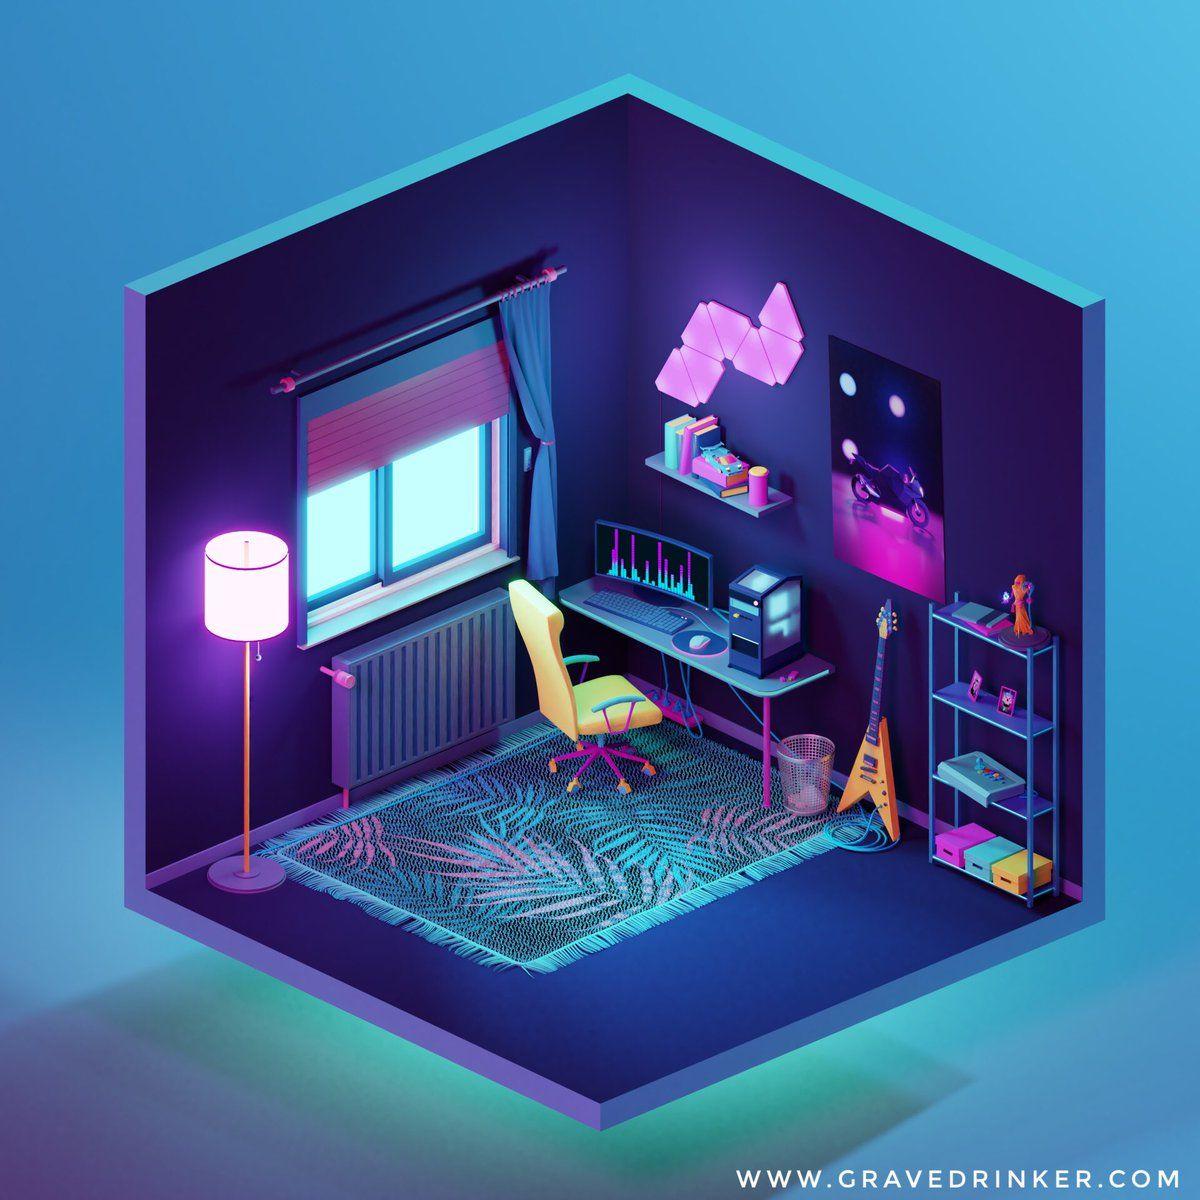 Gravedrinker on in 2020 Game room design, Futuristic